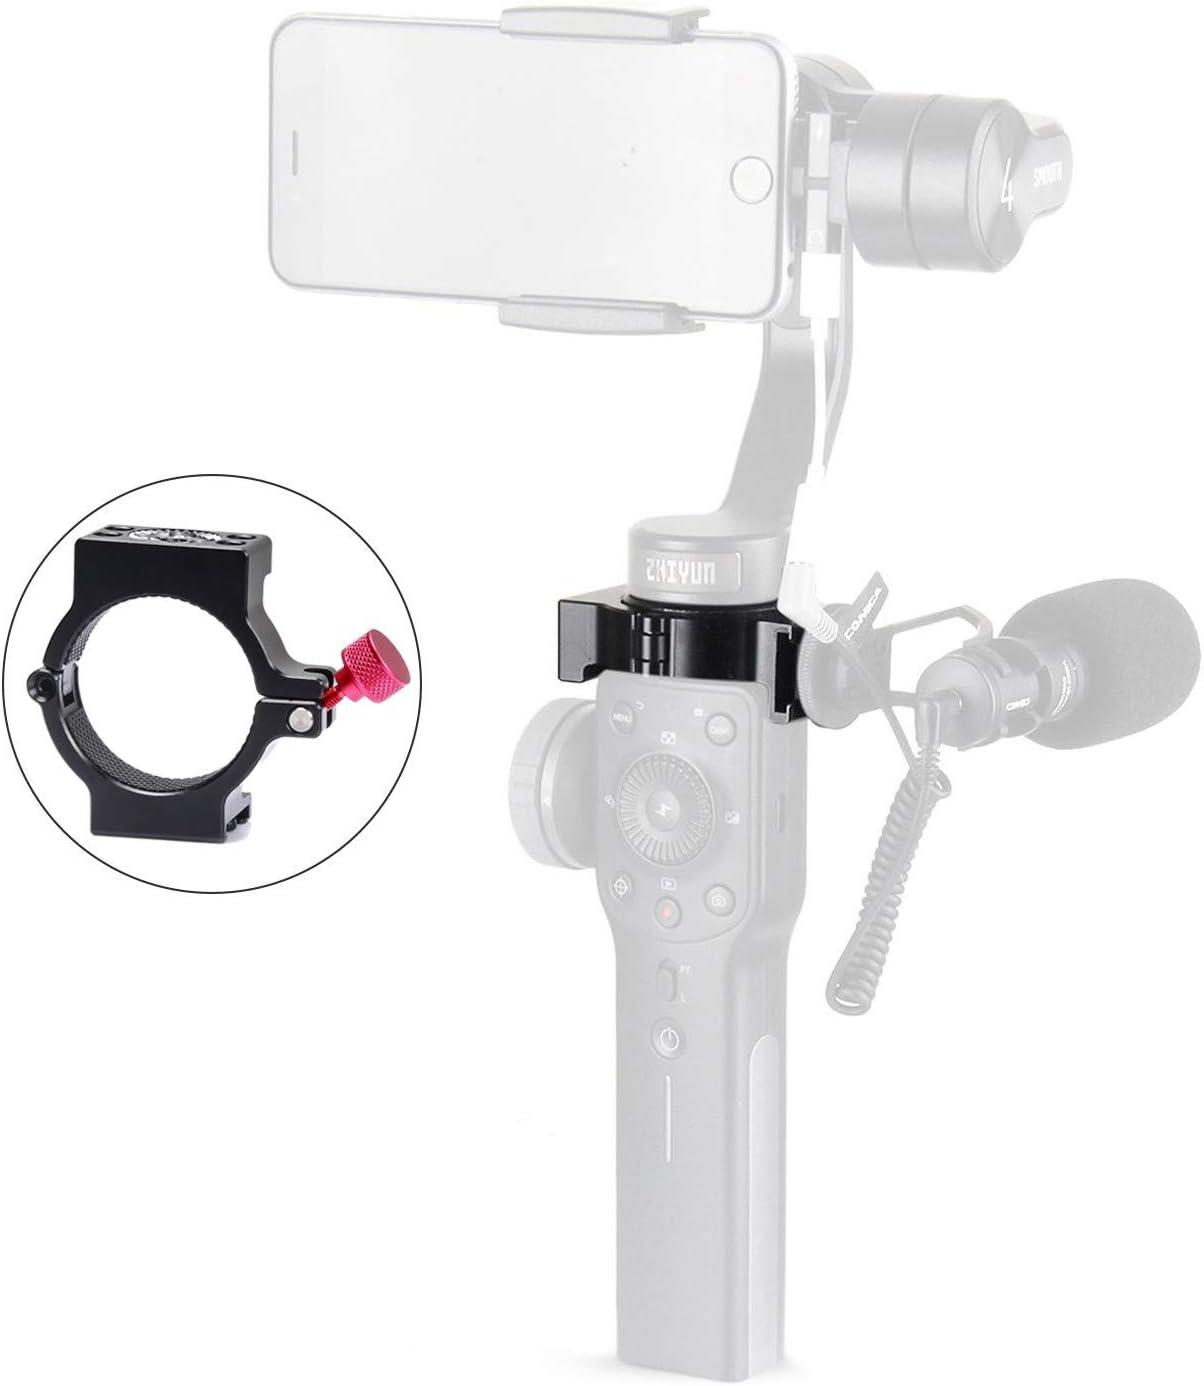 EACHSHOT 4-Ring V2 Cold Shoe Adapter Ring Zhiyun Smooth 4 Applied to Rode Microphone LED Video Light Filmmaker Vlog, Microphone Mount Designed Smooth4 Rosette Mount [Updated Version]